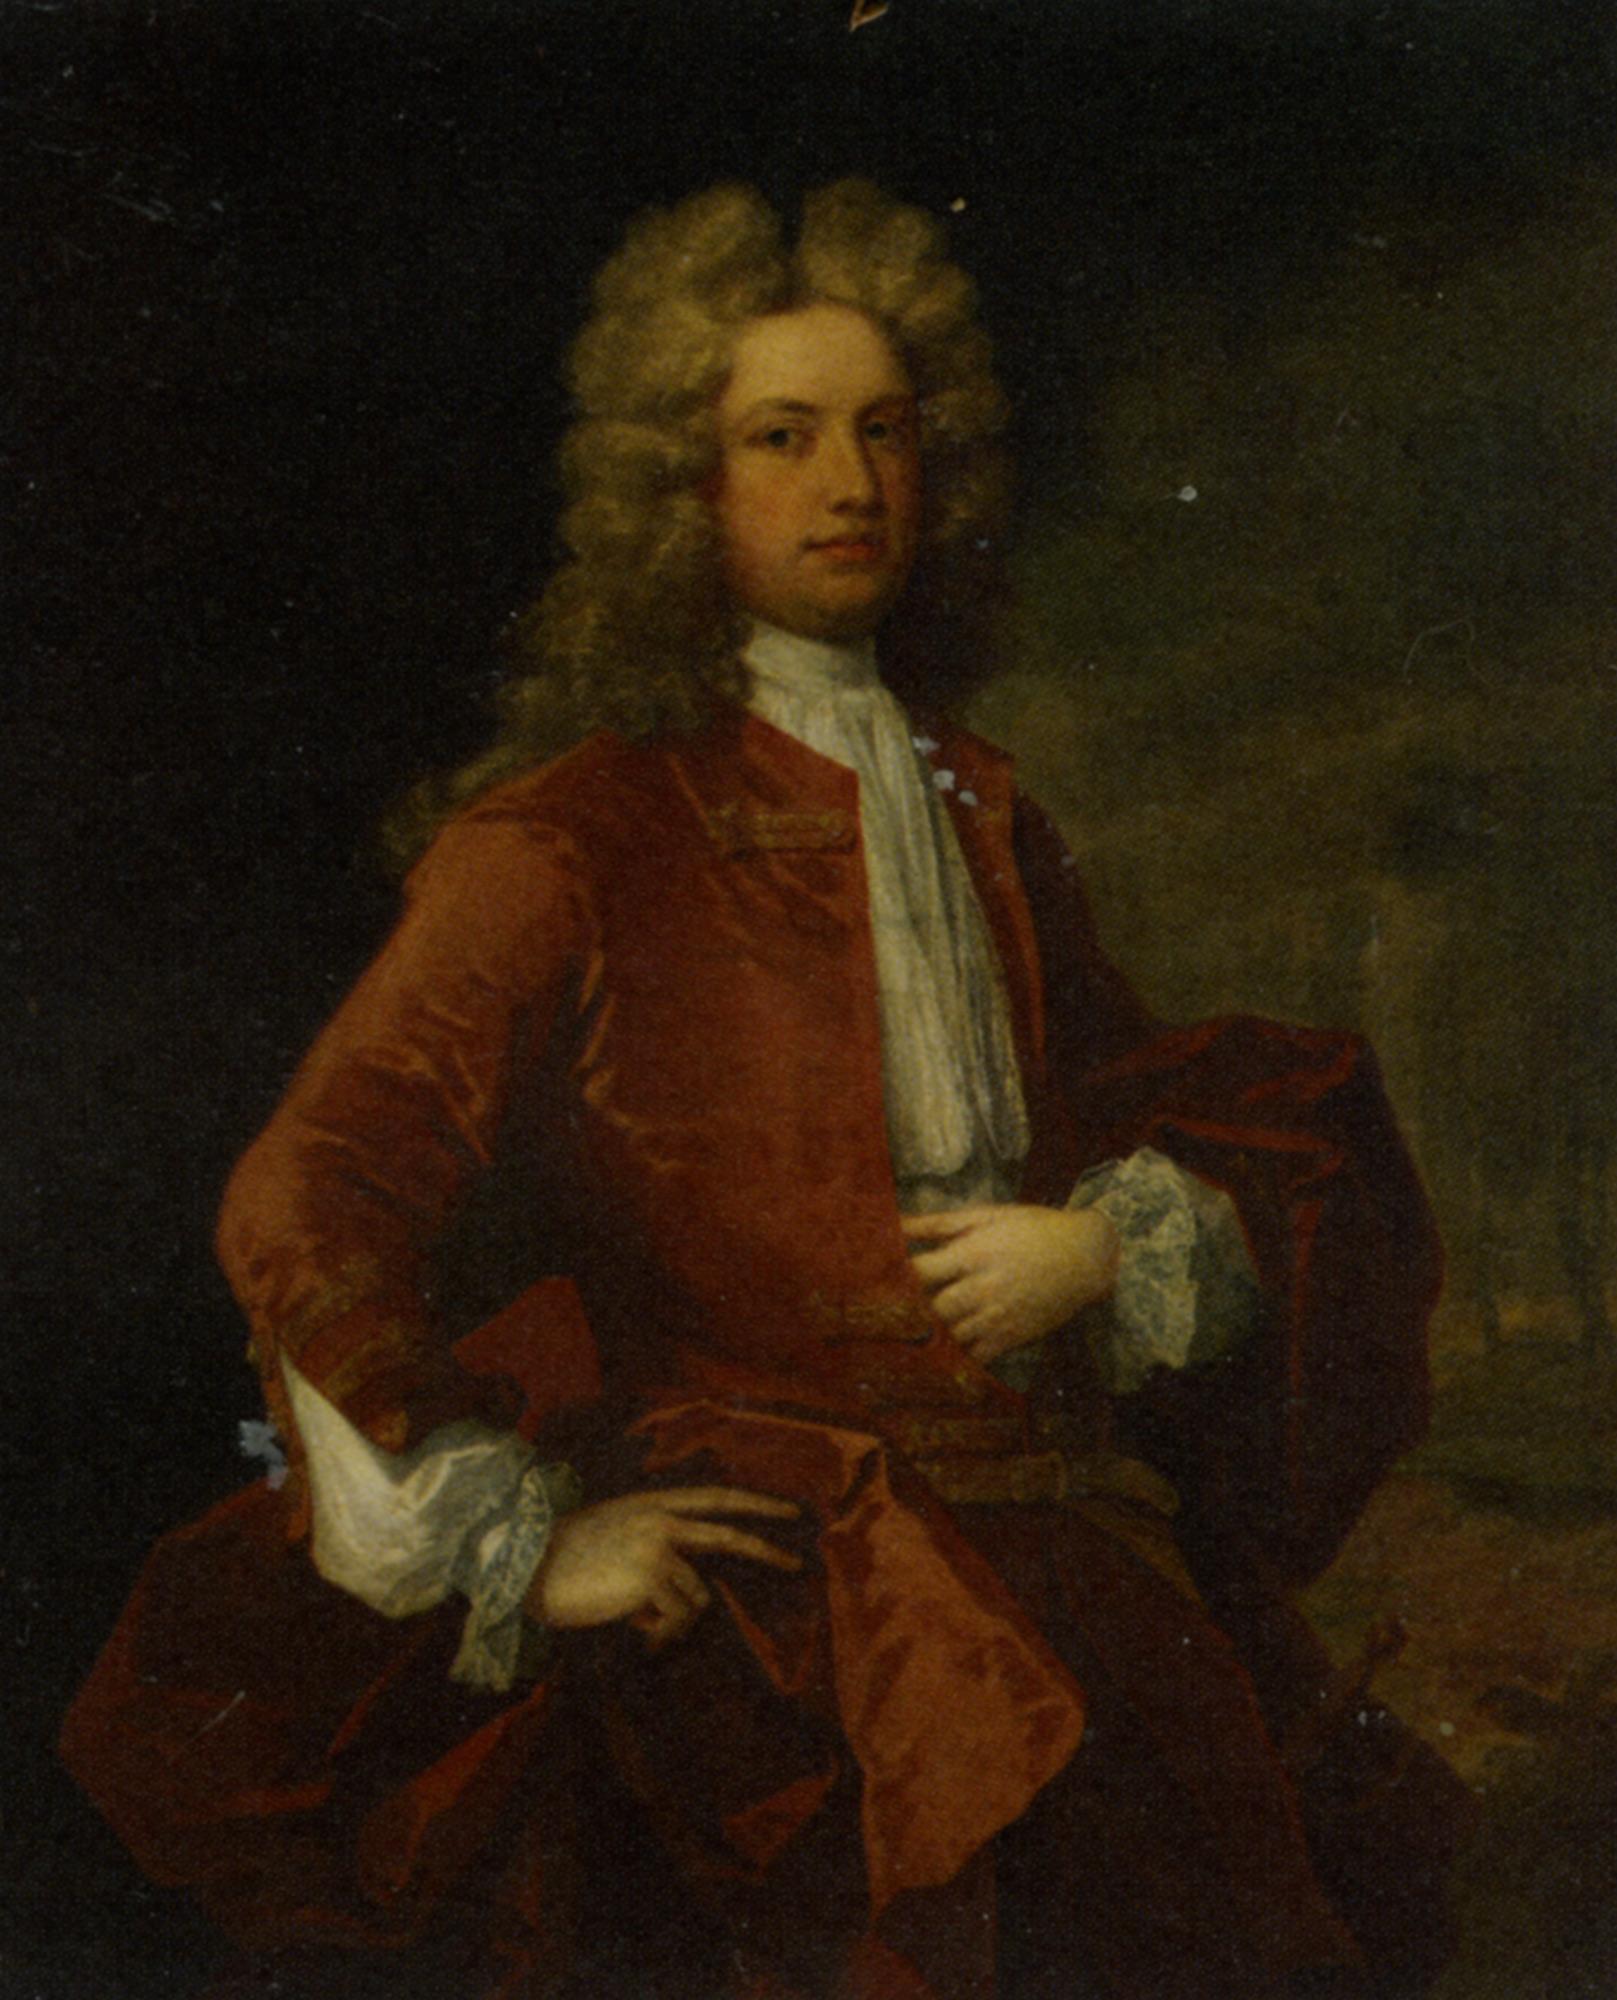 Portrait of Thomas Western Esq in a Red Coat :: Charles Jervas - men's portraits 18th century ôîòî